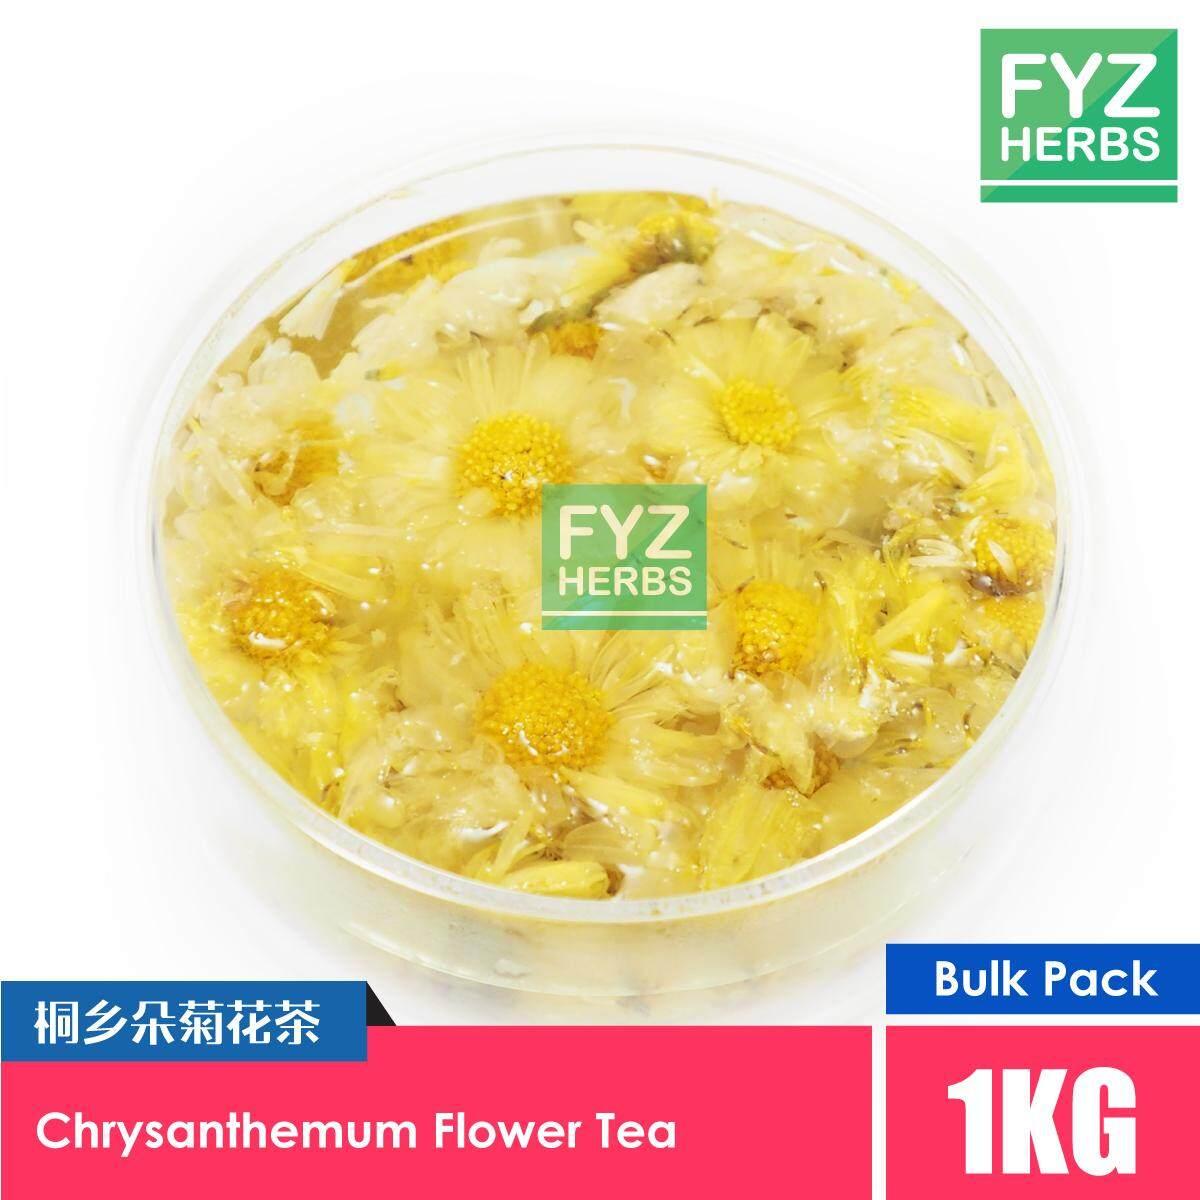 FYZ Herbs Chrysanthemum Flower Tea 1KG [Bulk Pack] 桐乡朵菊花茶袋装 1KG